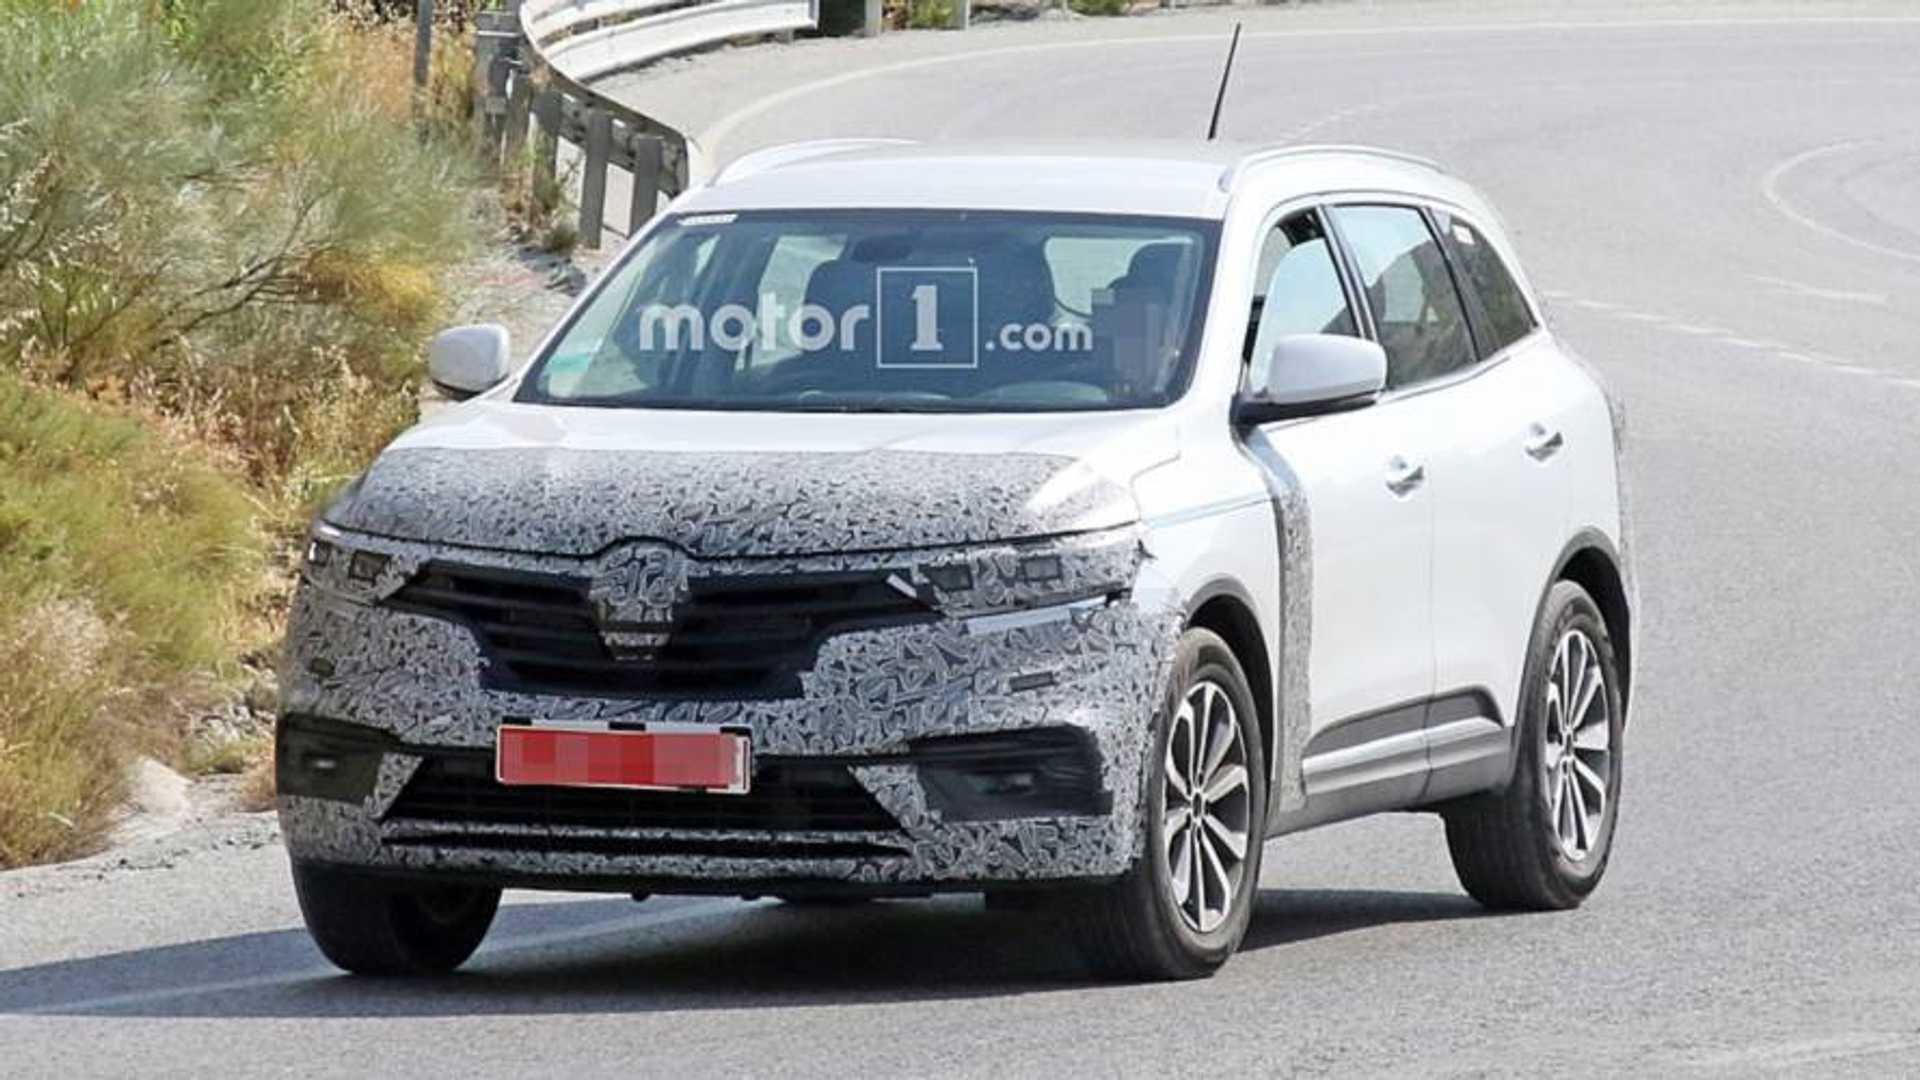 Renault Koleos Spied Hiding A Modest Facelift